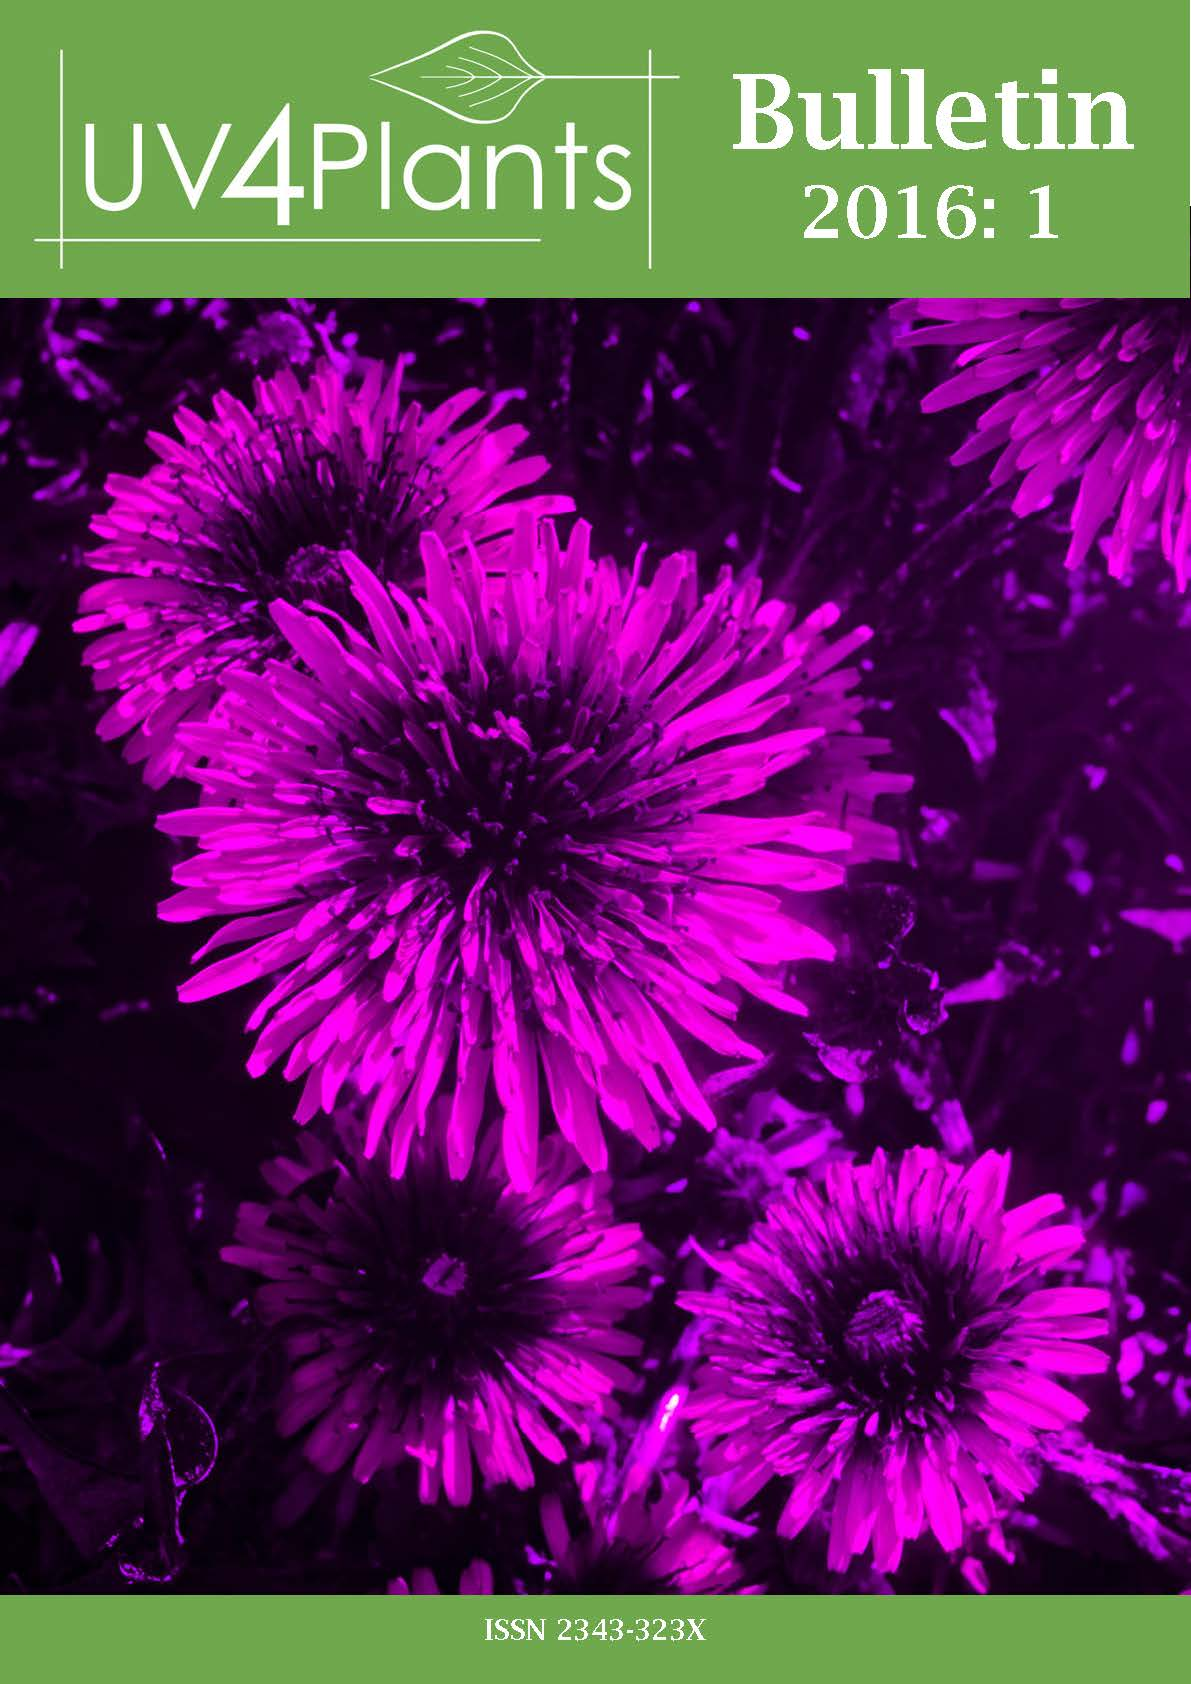 Cover of the UV4Plants Bulletin 2016:1